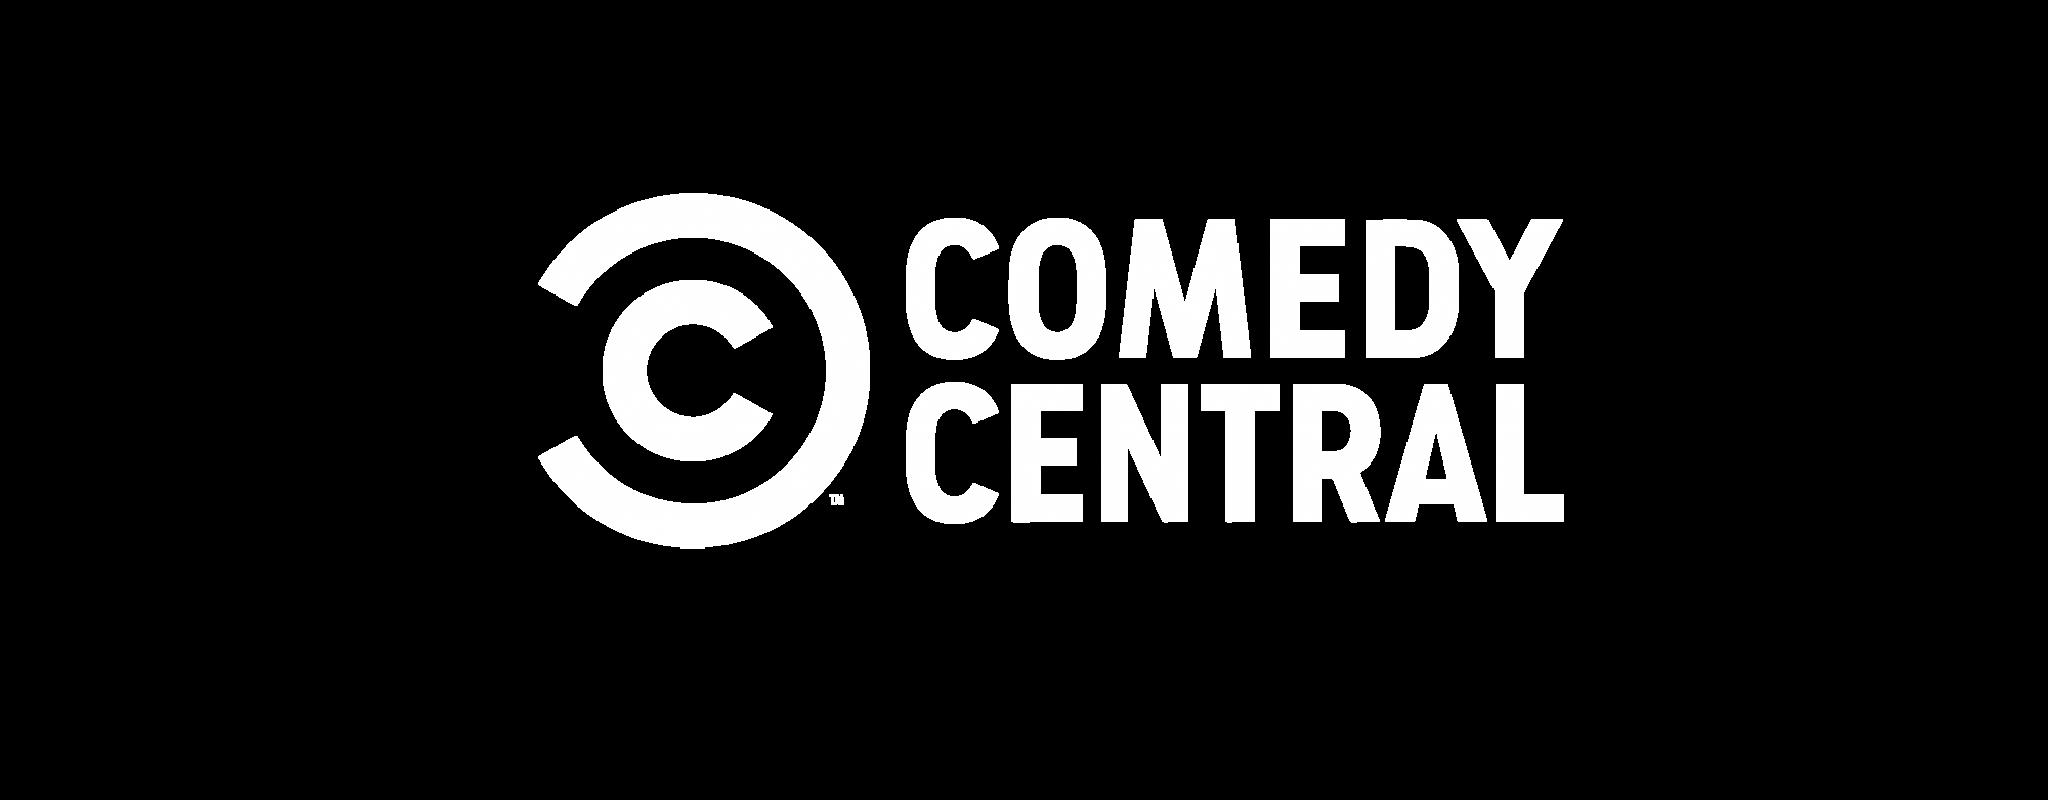 COMEDY-CENTRAL